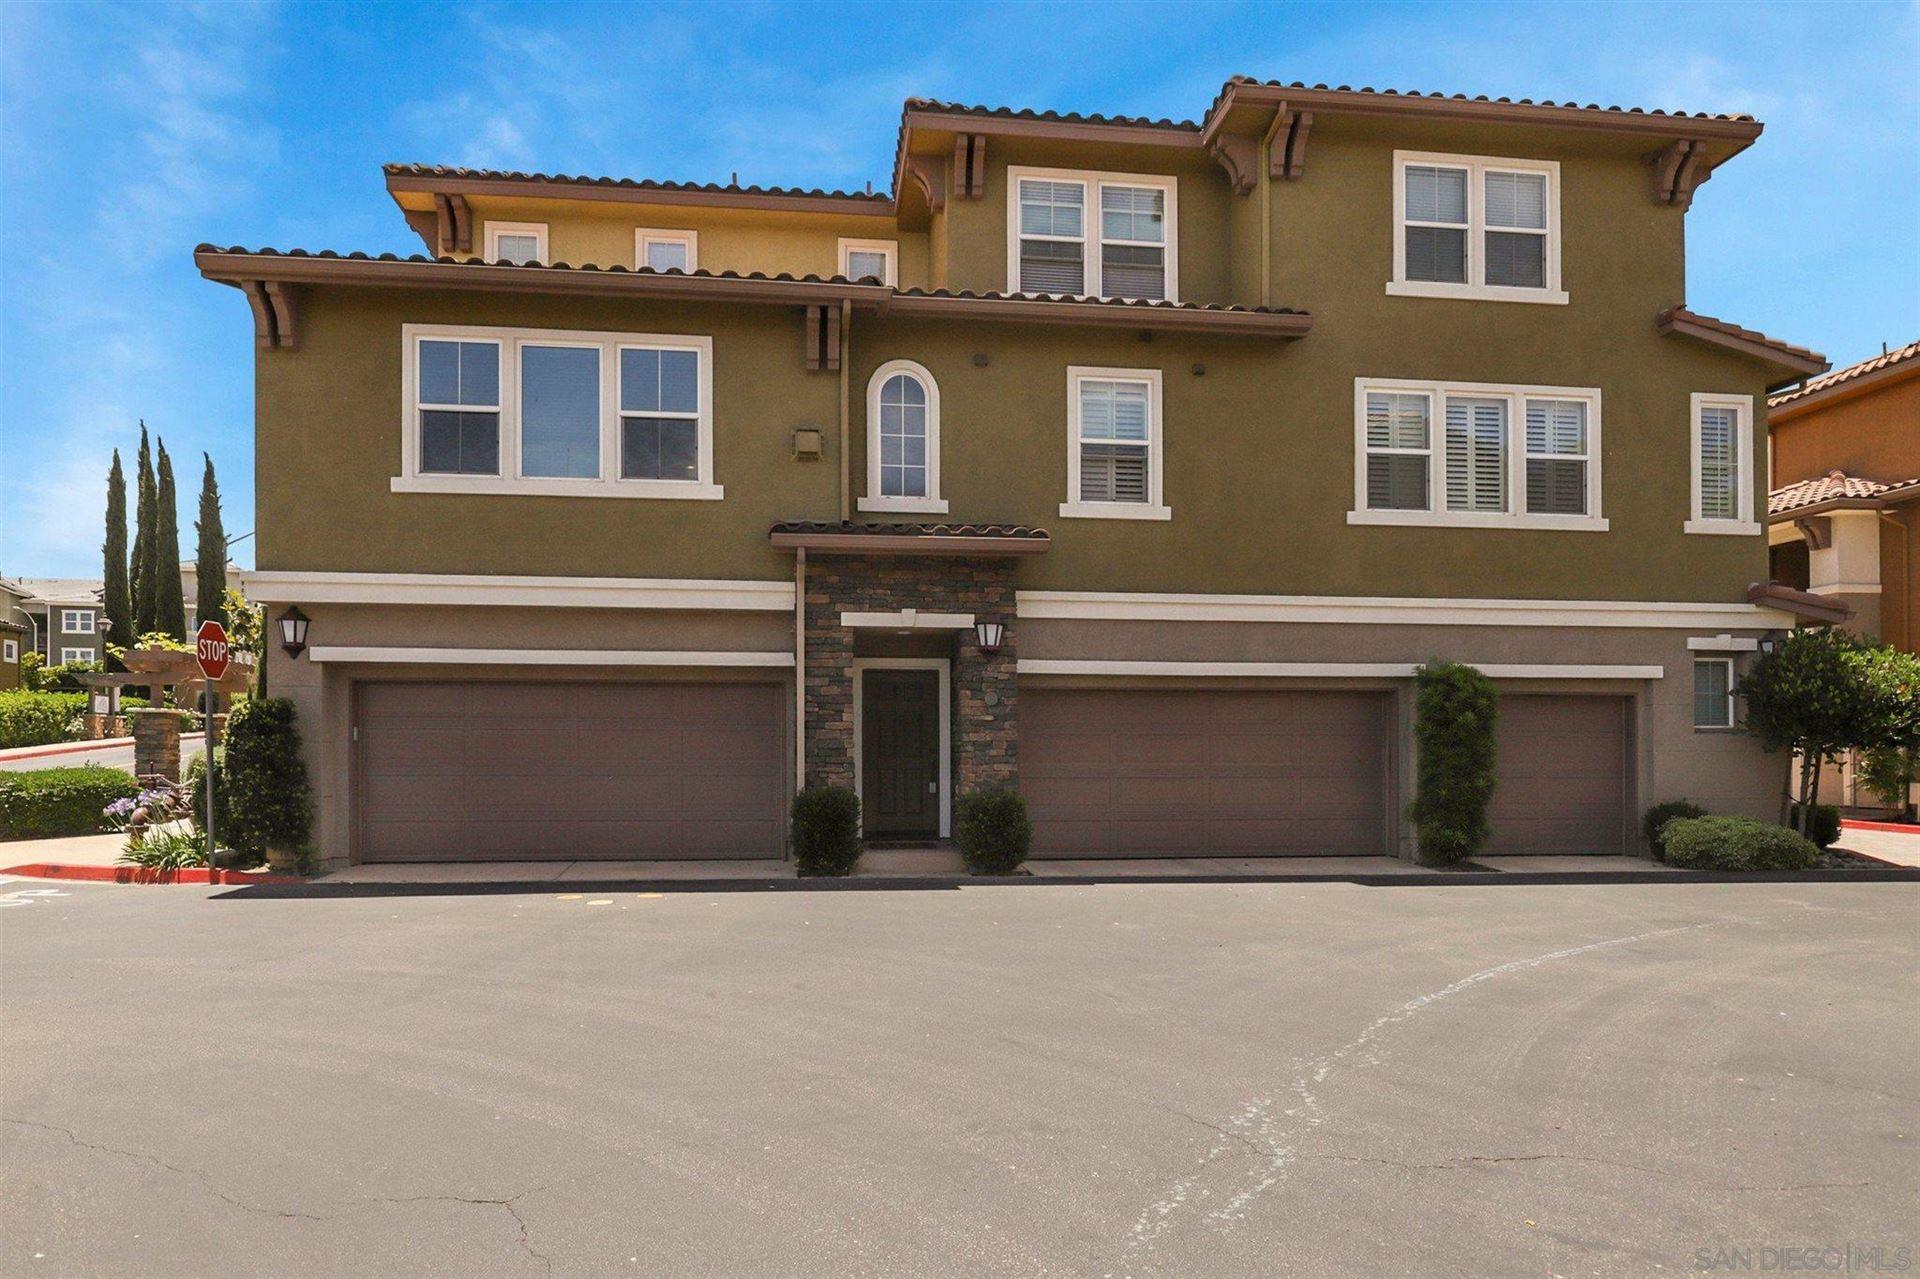 Photo of 2 Via Montisi, Santee, CA 92071 (MLS # 210016002)